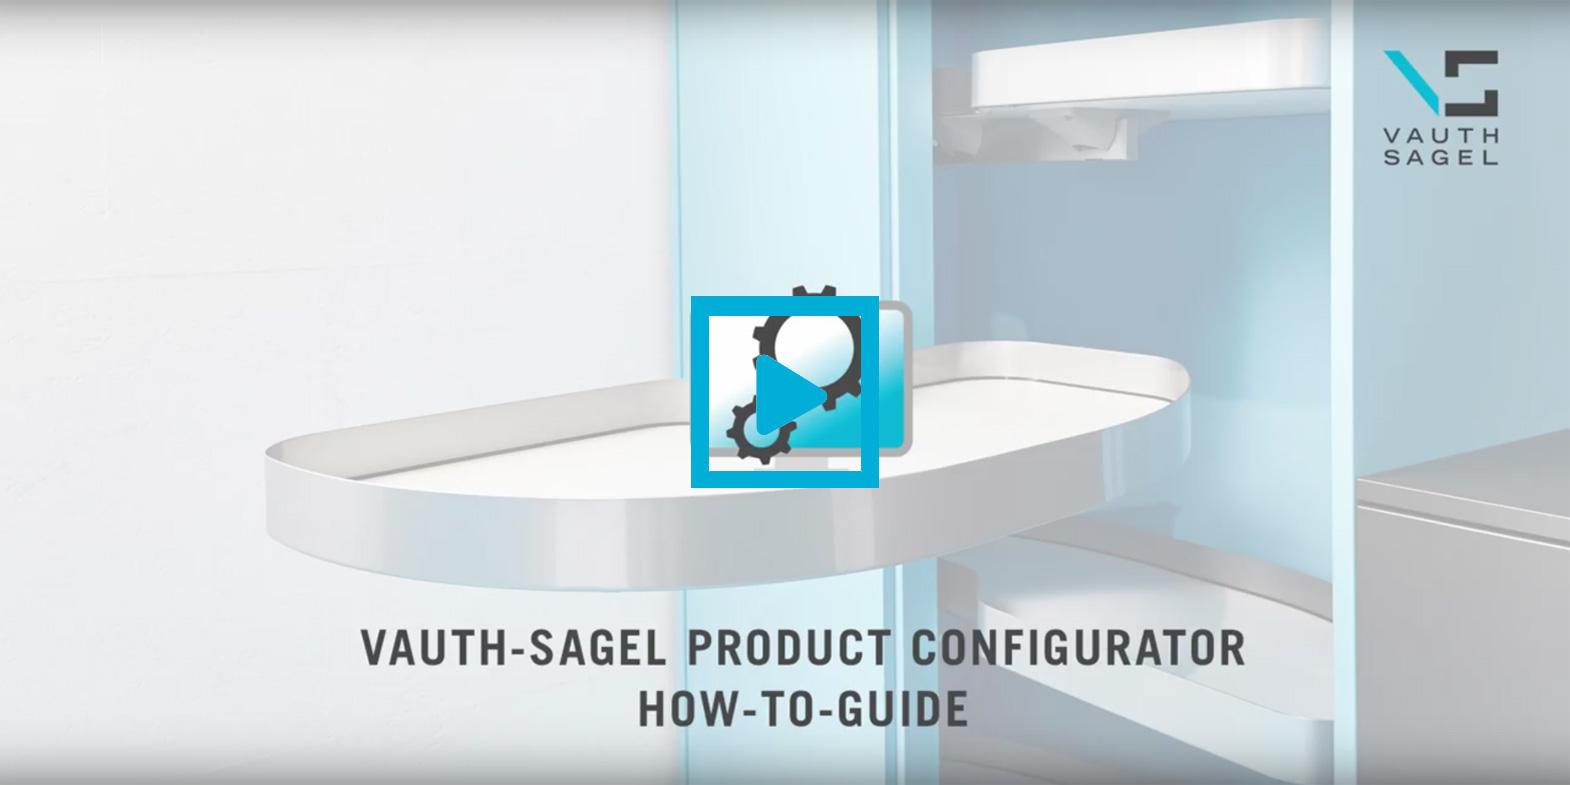 Vauth-Sagel: Media Portal & Product Configurator